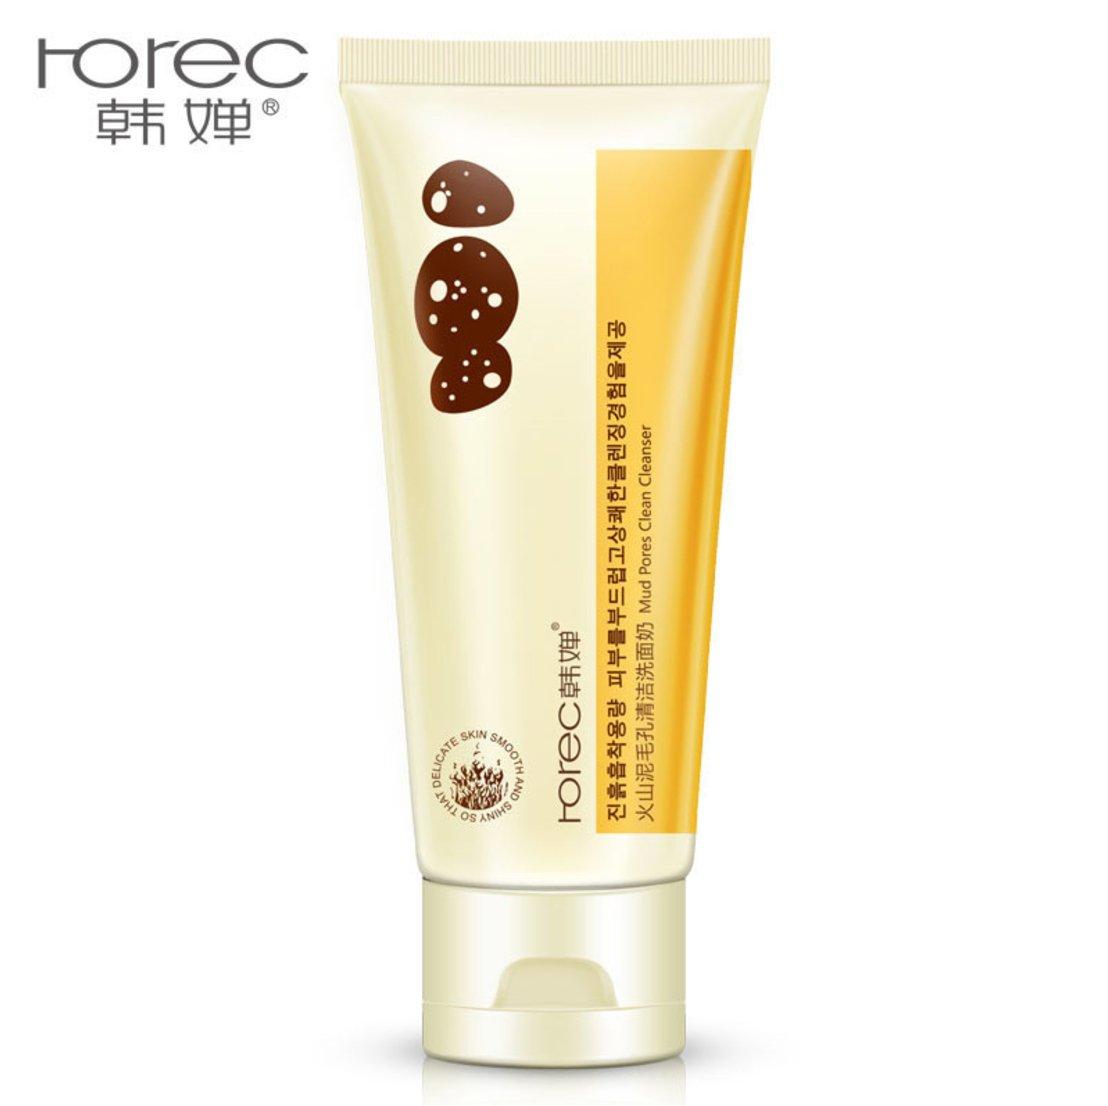 ROREC Volcanic Mud Clean Pore Cleanser Foam Natural Skin Сare Moisture